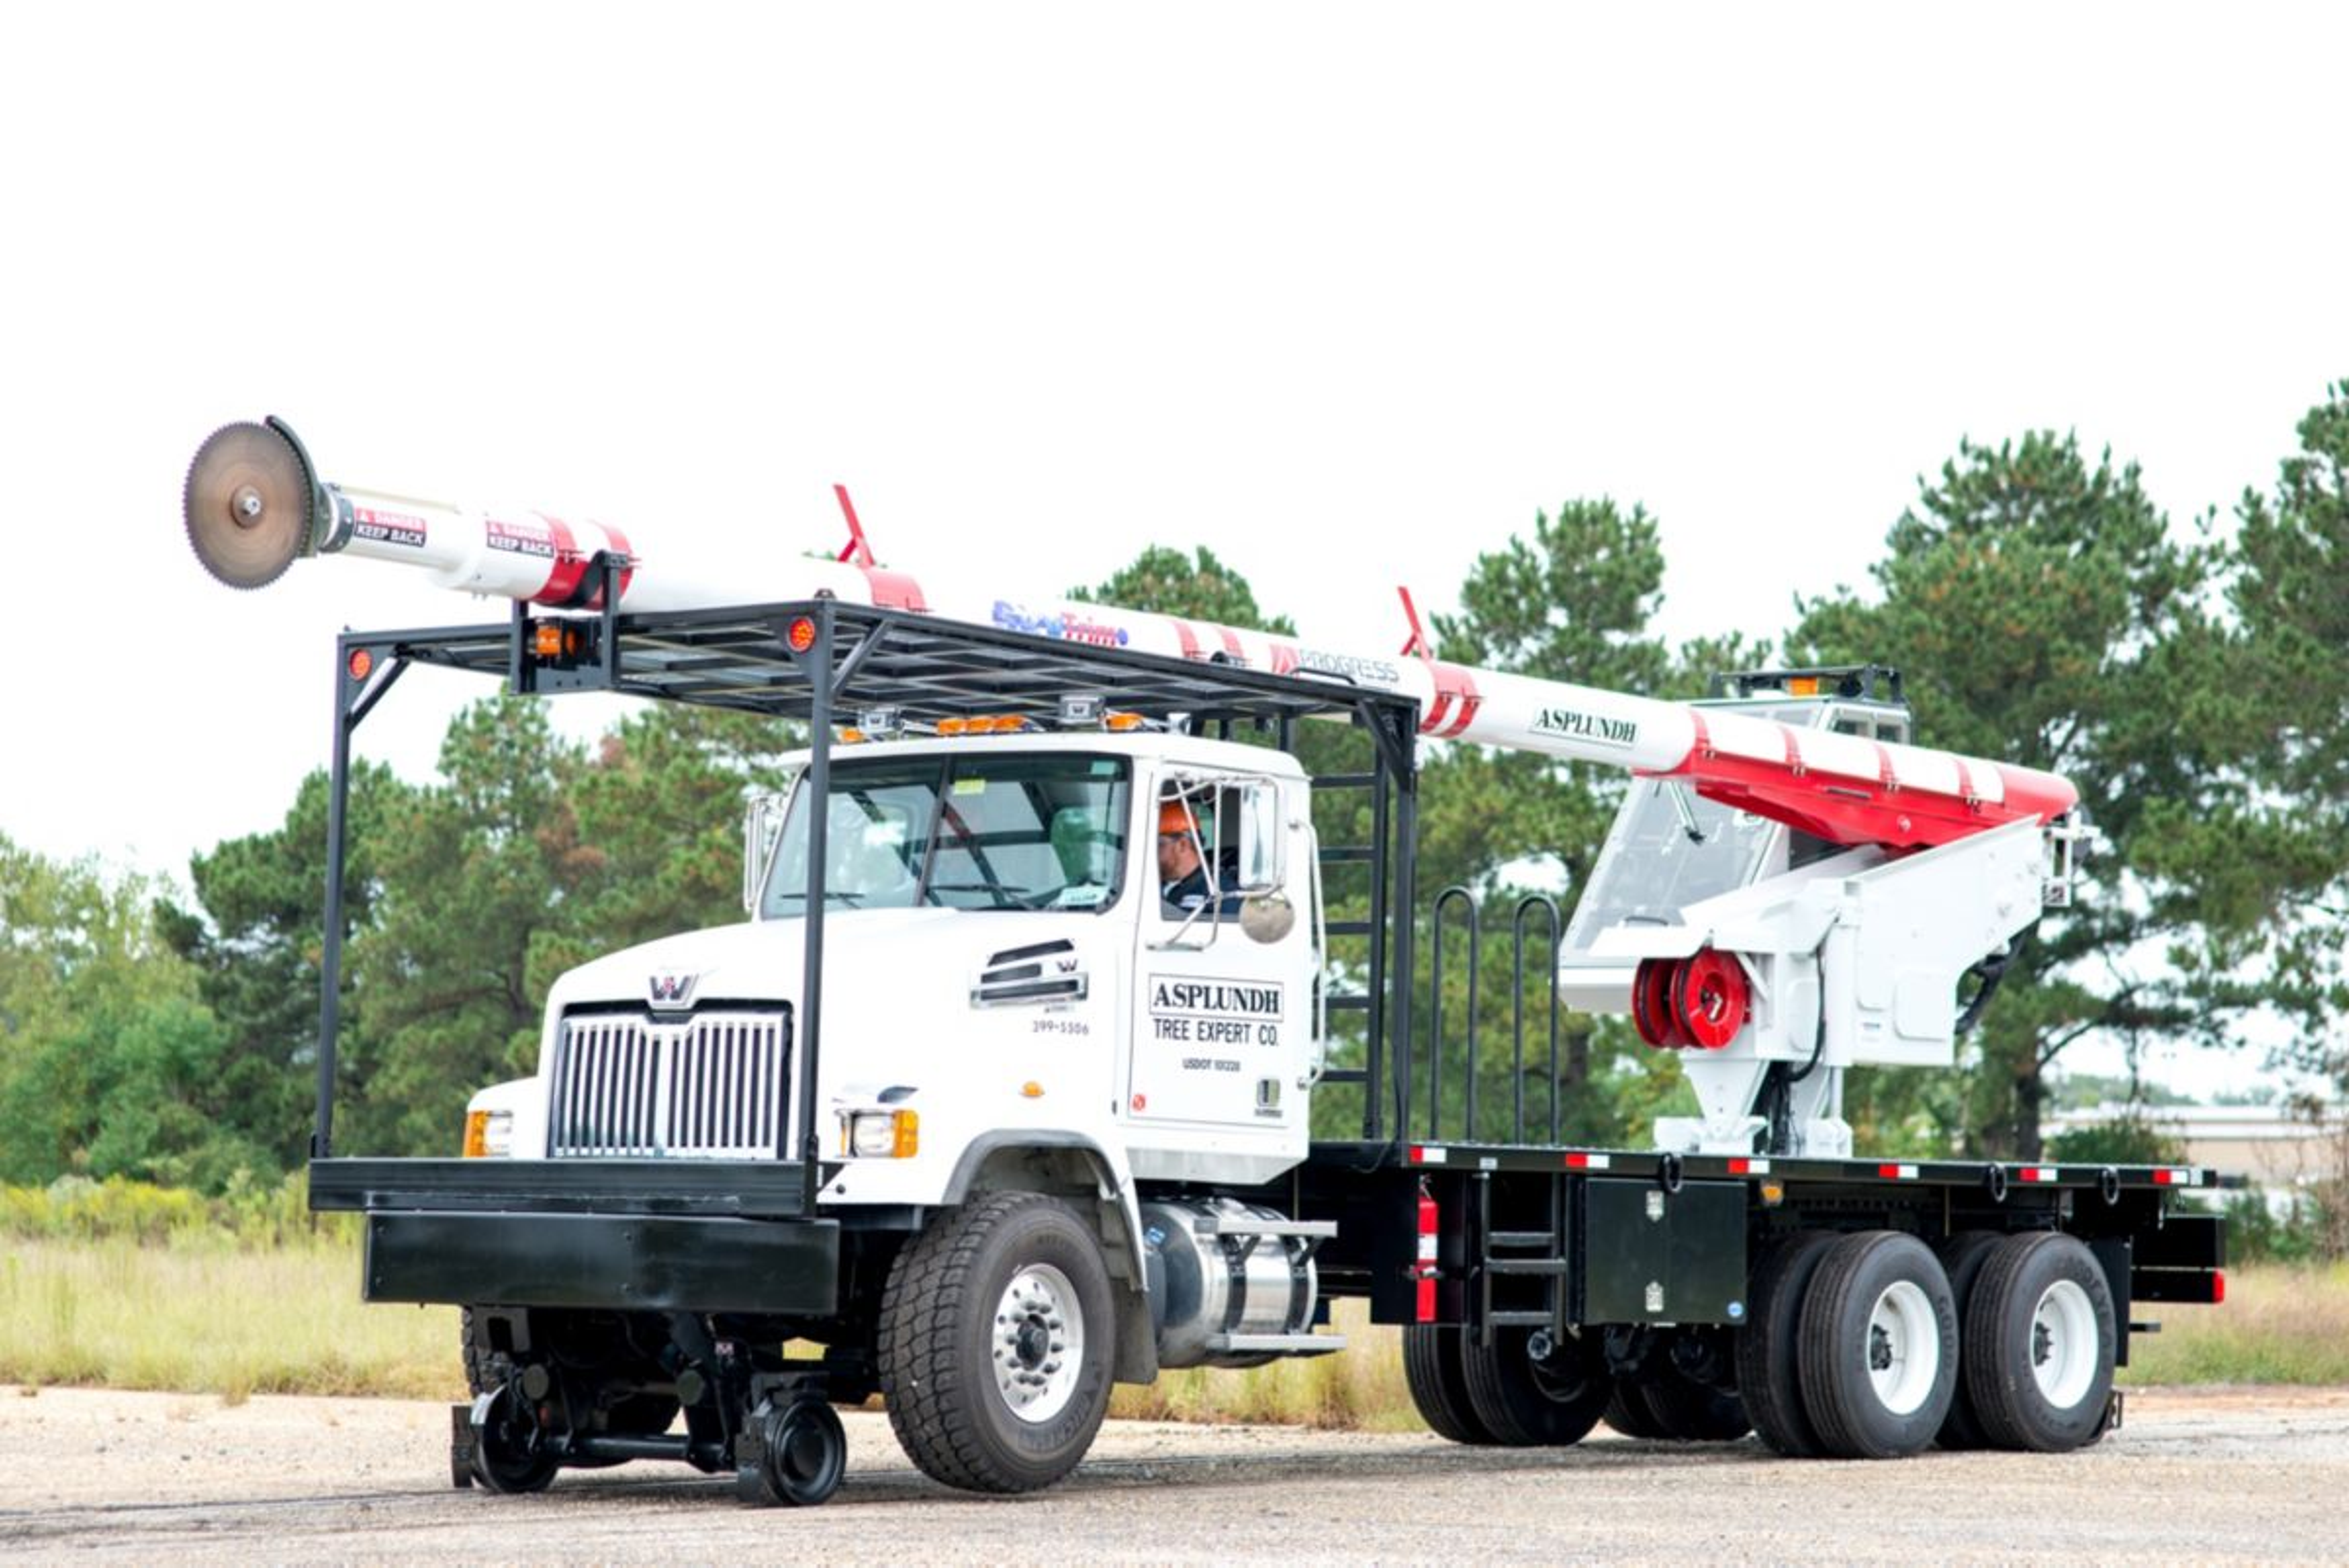 SkyTrim 75HRT, Mechanical Tree Trimmer